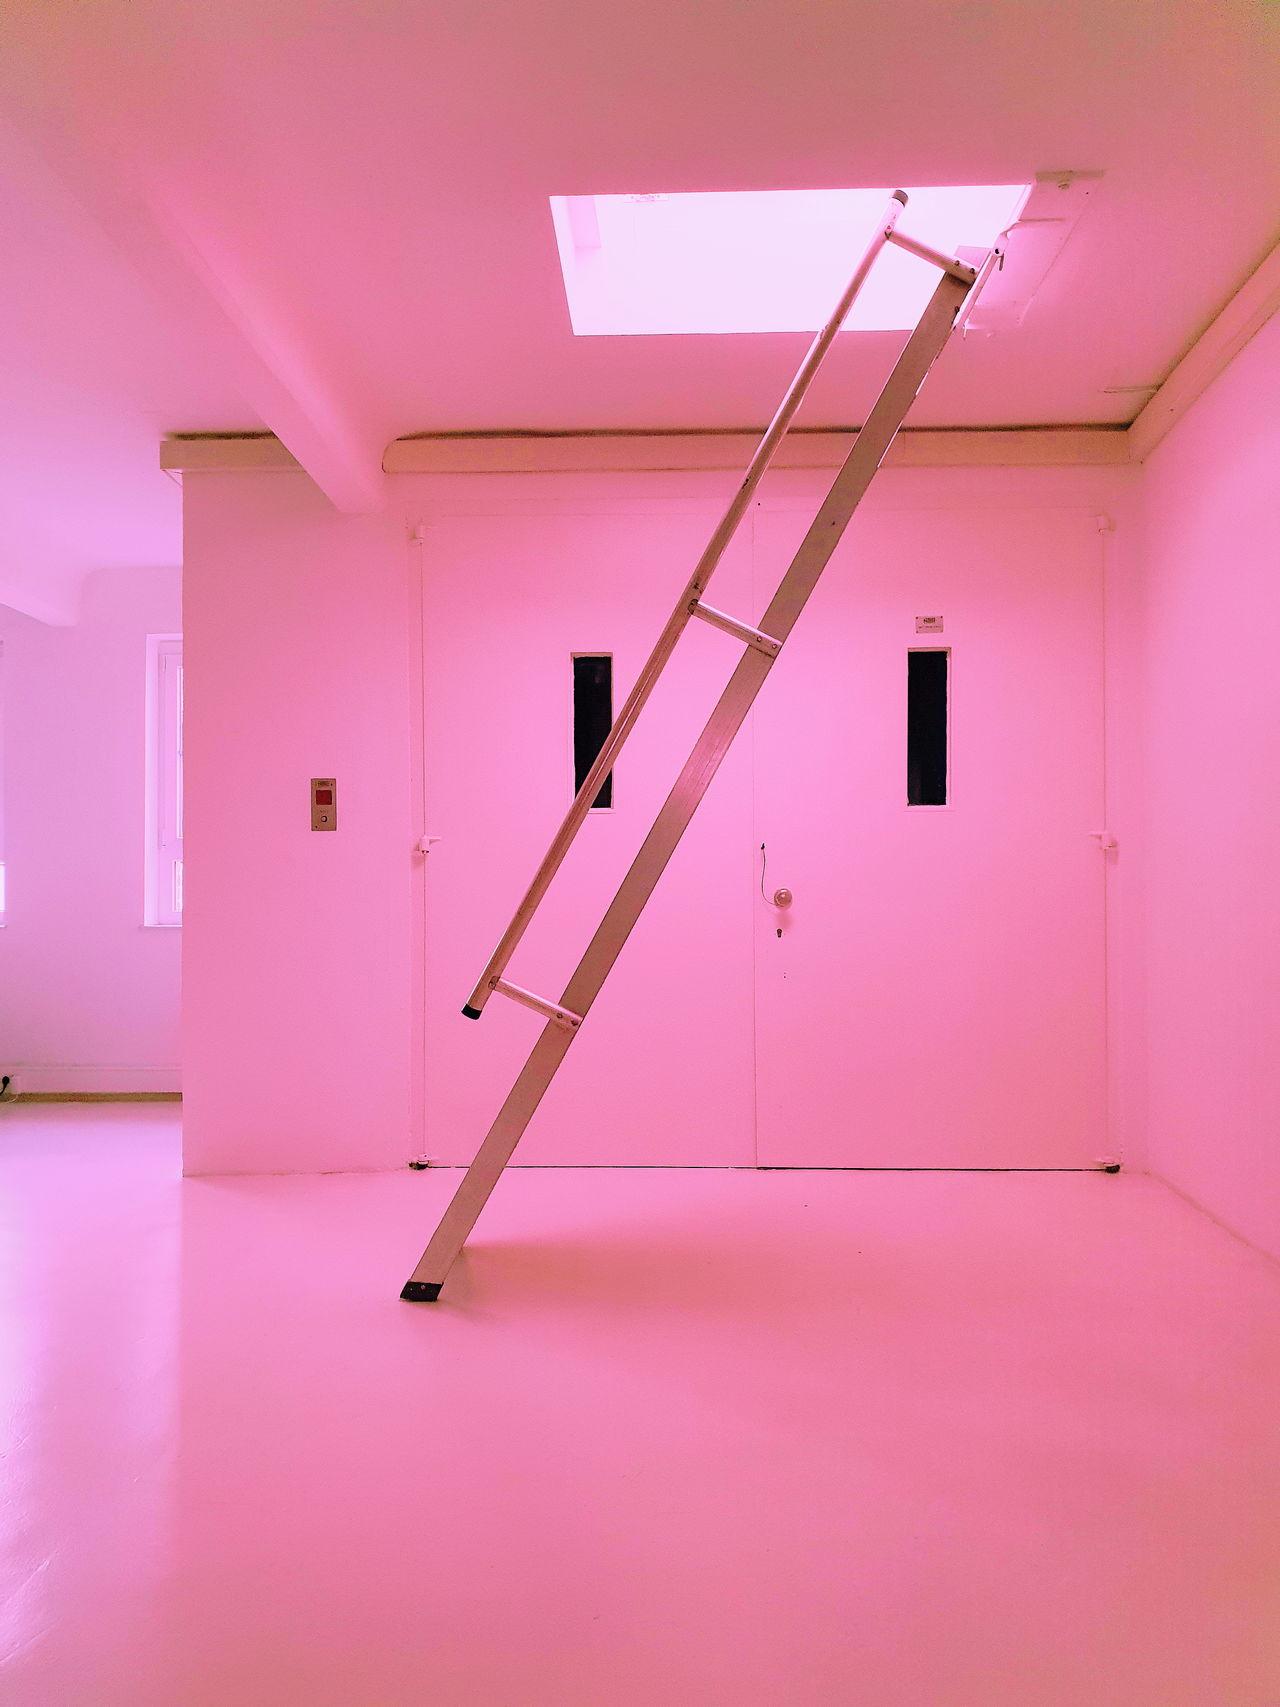 Closed,  Day,  Door,  Flooring,  Germany